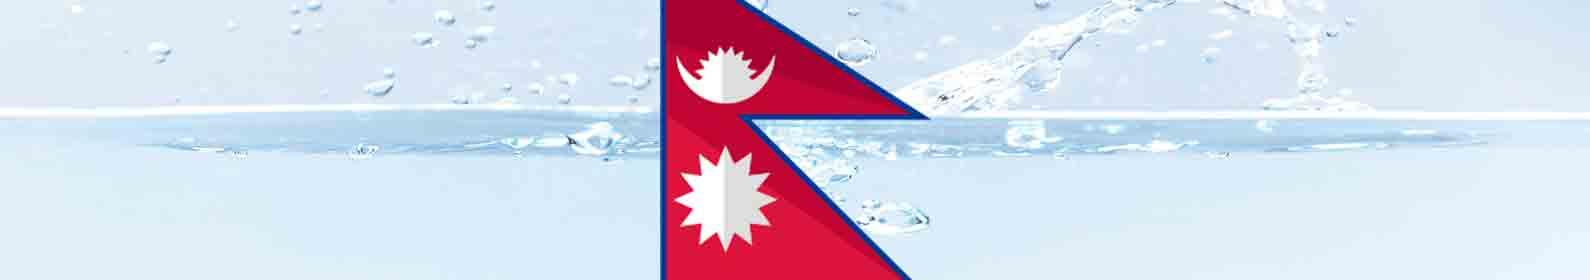 water-treatment-nepal.jpg